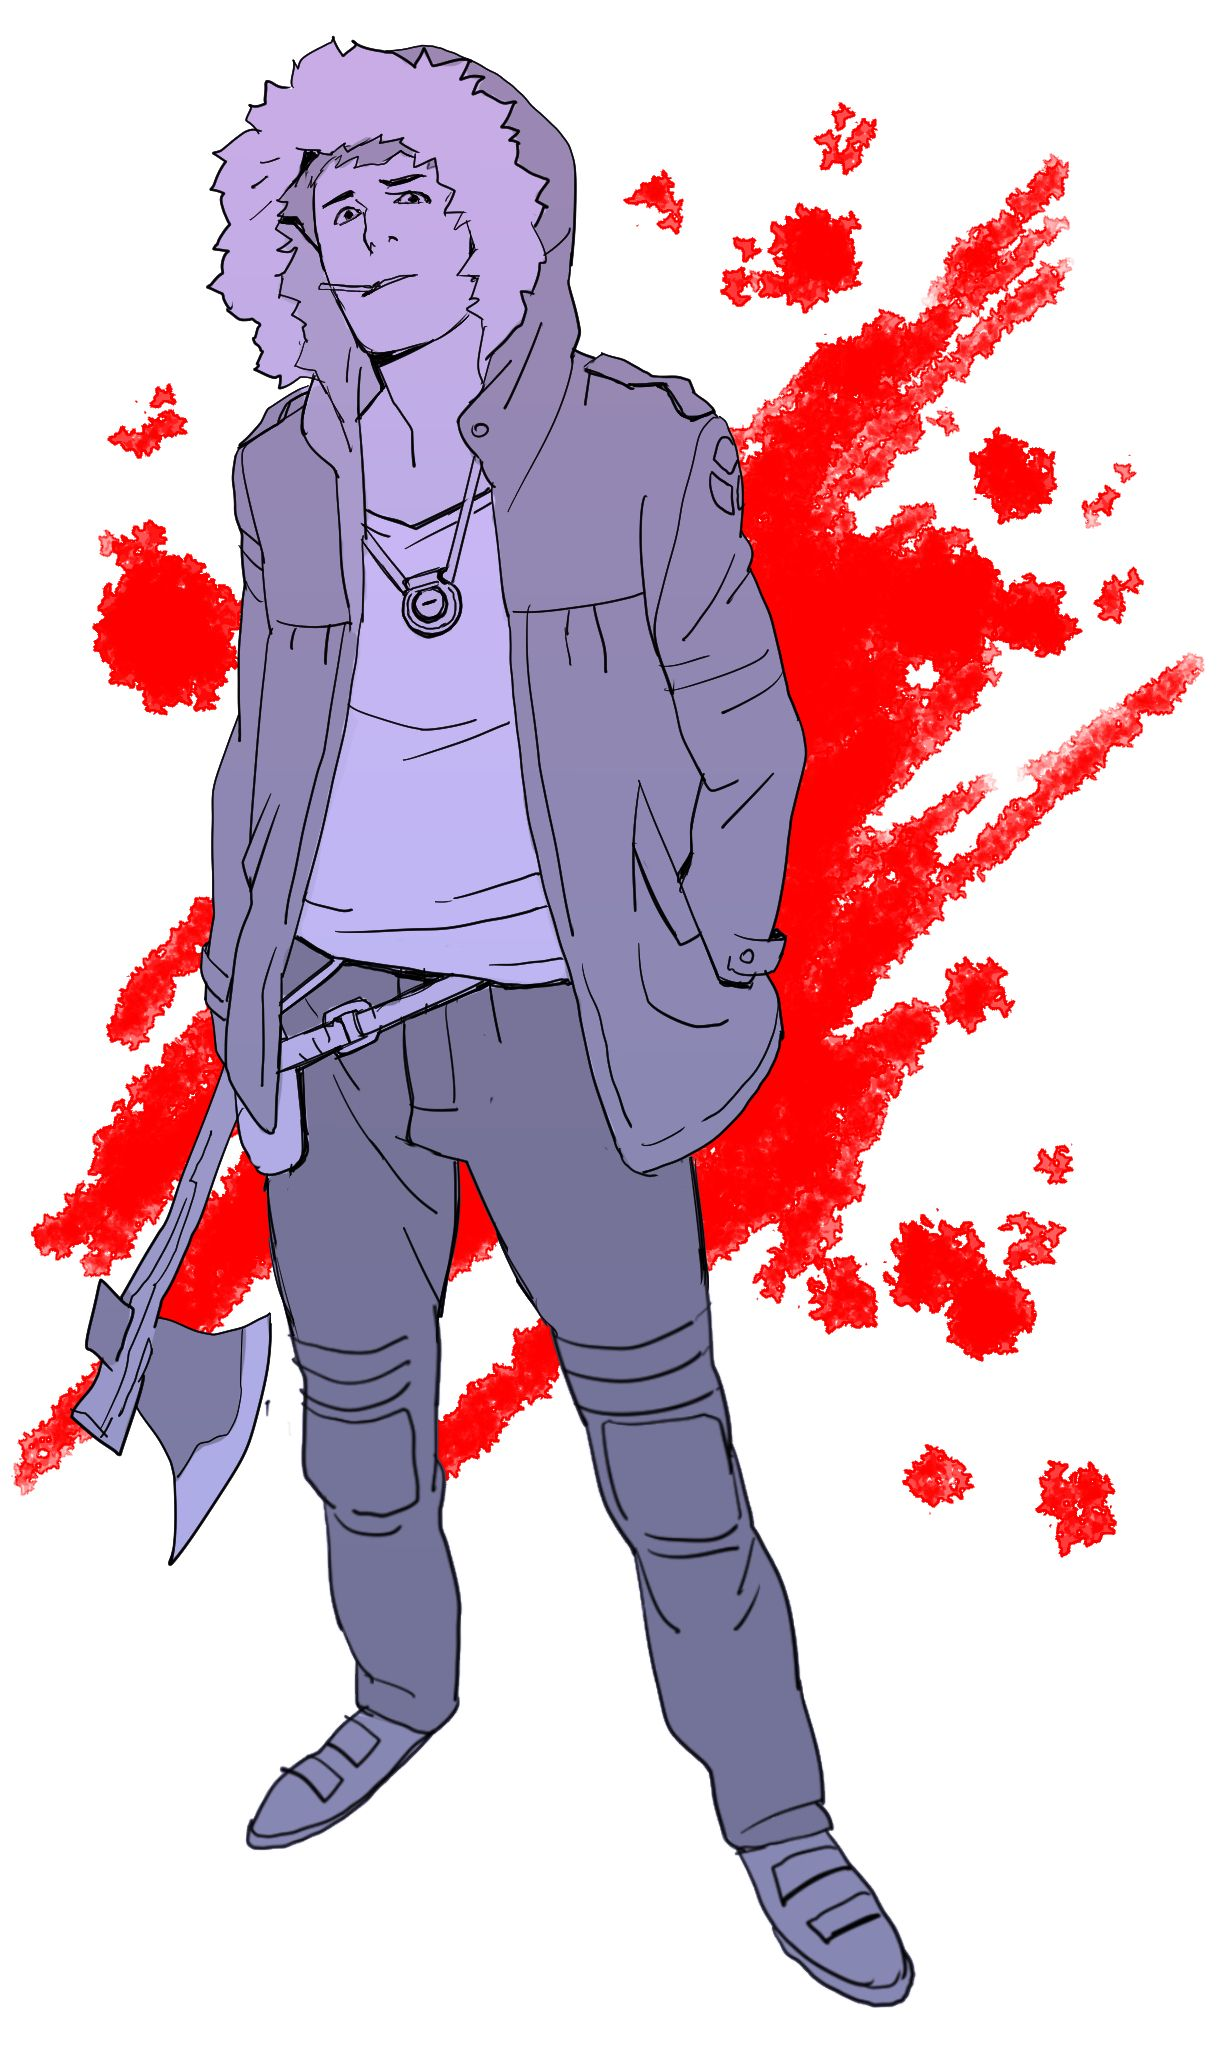 Artist Dae Woo Lee Design Character Concept Art Comics Cartoons Illustration Art Https Www Facebook Com Adaewoo Sketches Artwork Anime